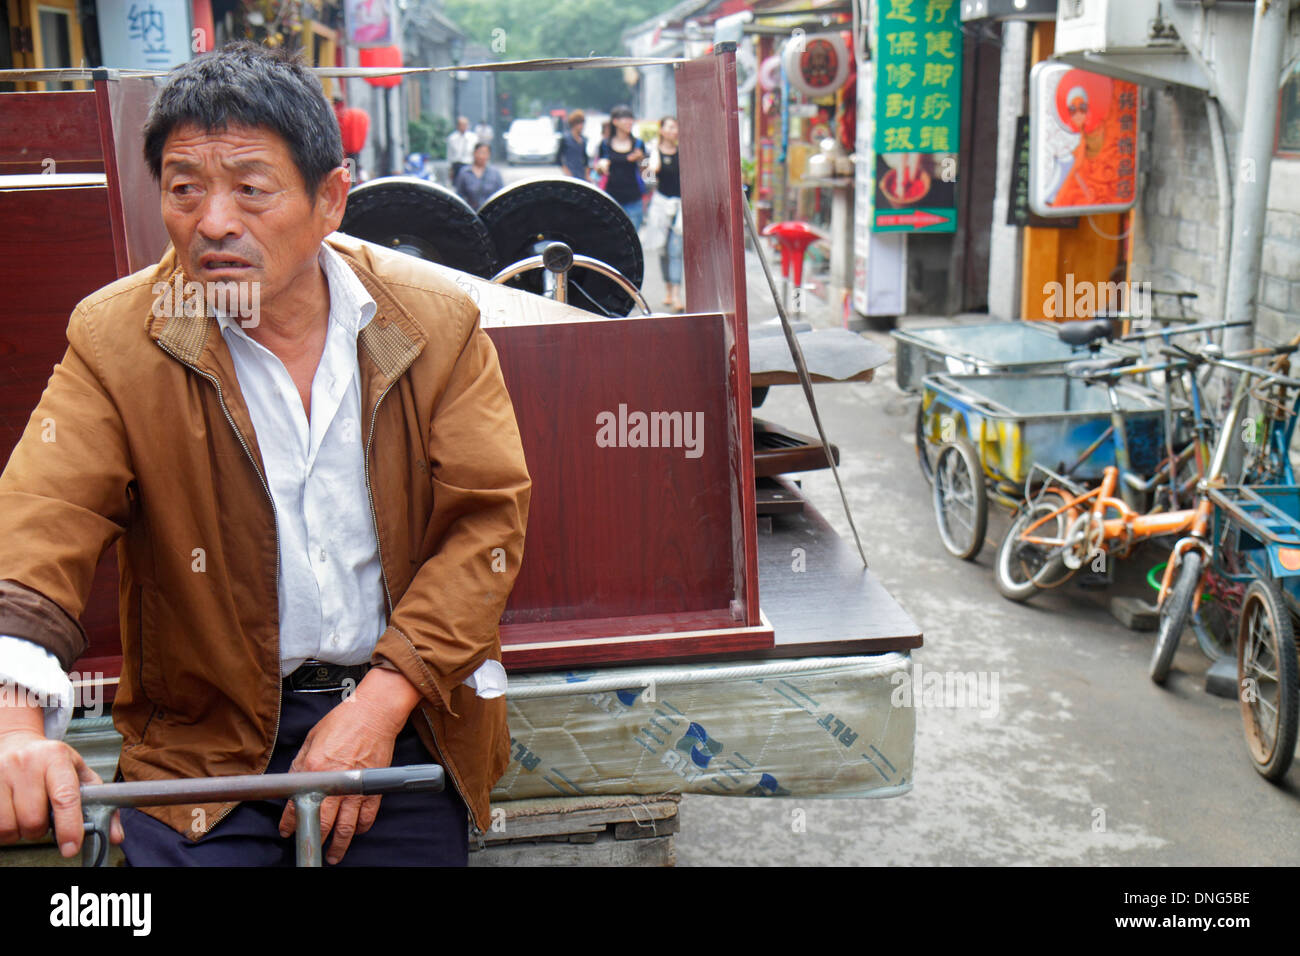 beijing stock man shopping hauling images nanluoguxiang tricycle furniture cart district china dongcheng photos photo hutong alamy asian historic